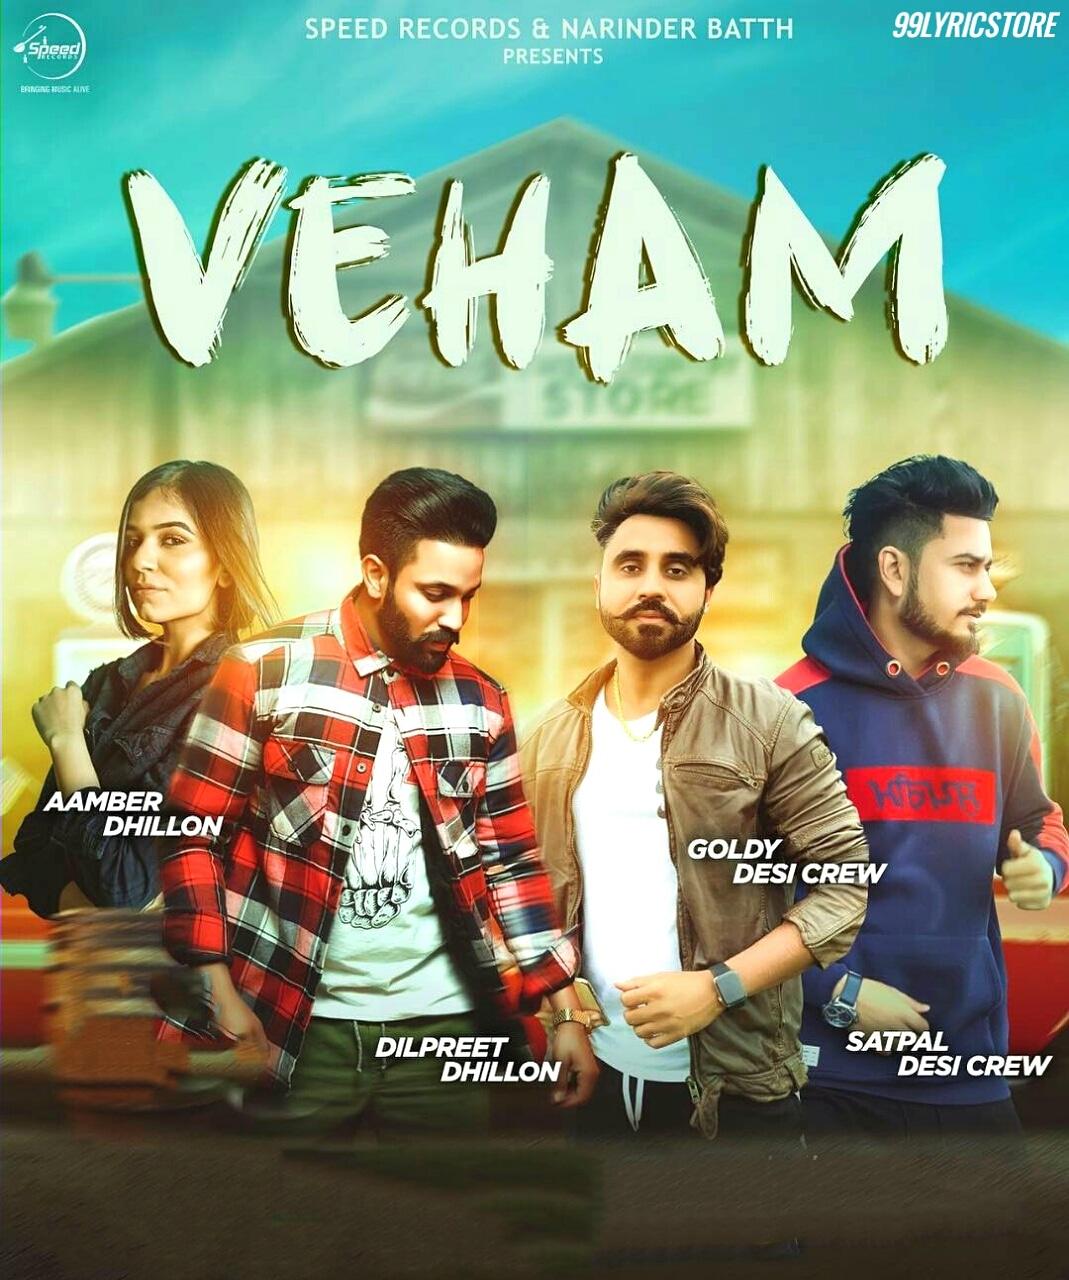 Veham Lyrics Sung by Dilpreet Dhillon